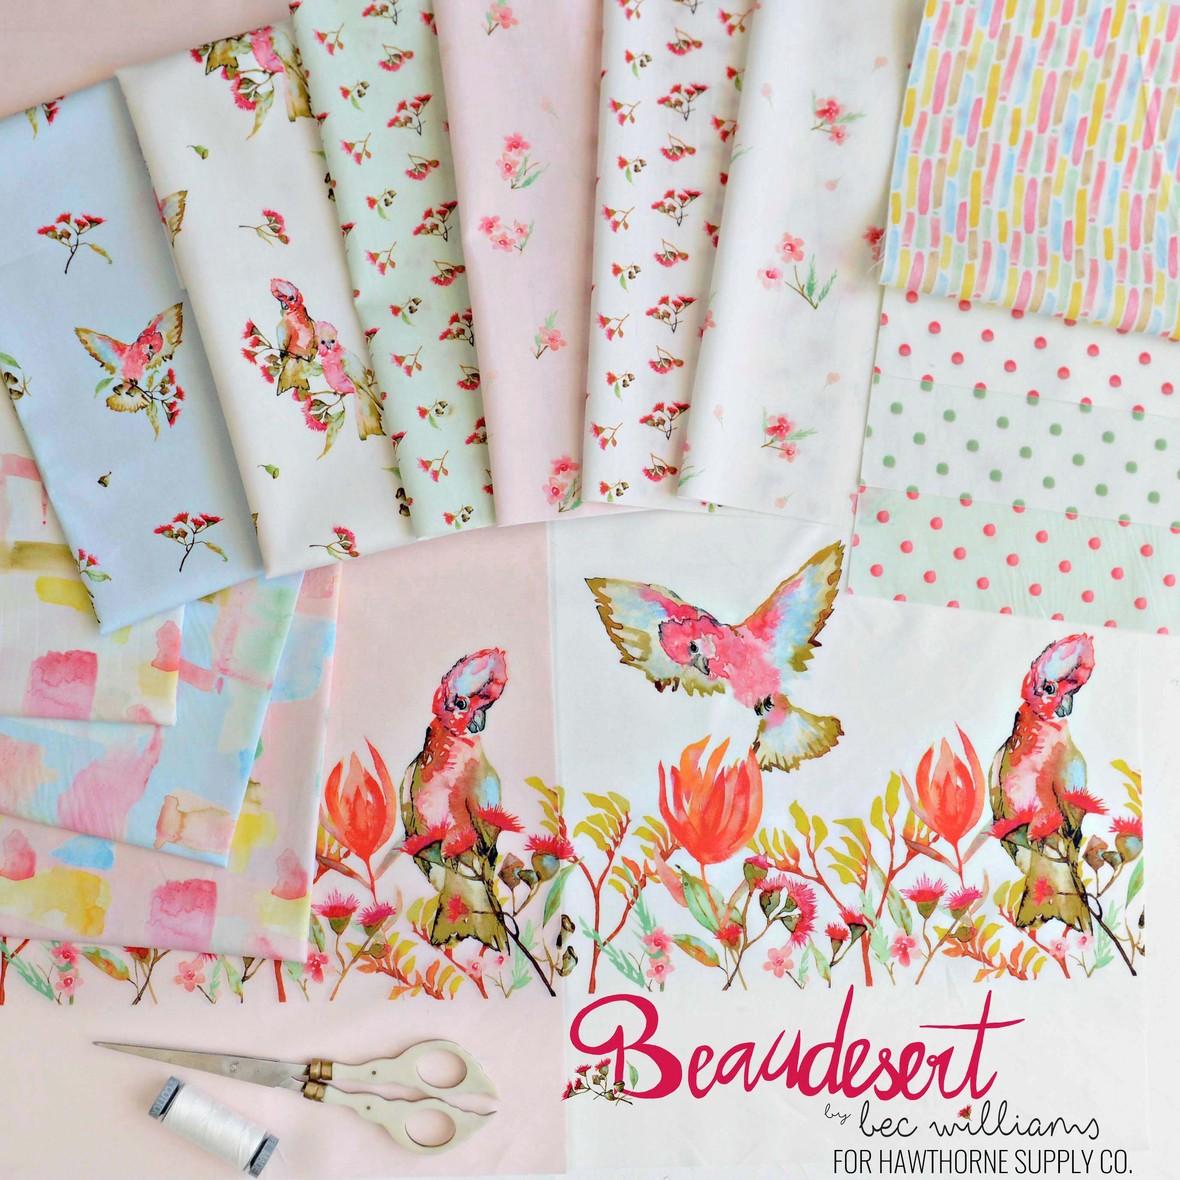 Beaudesert from Bec Williams For Hawthorne Supply Co